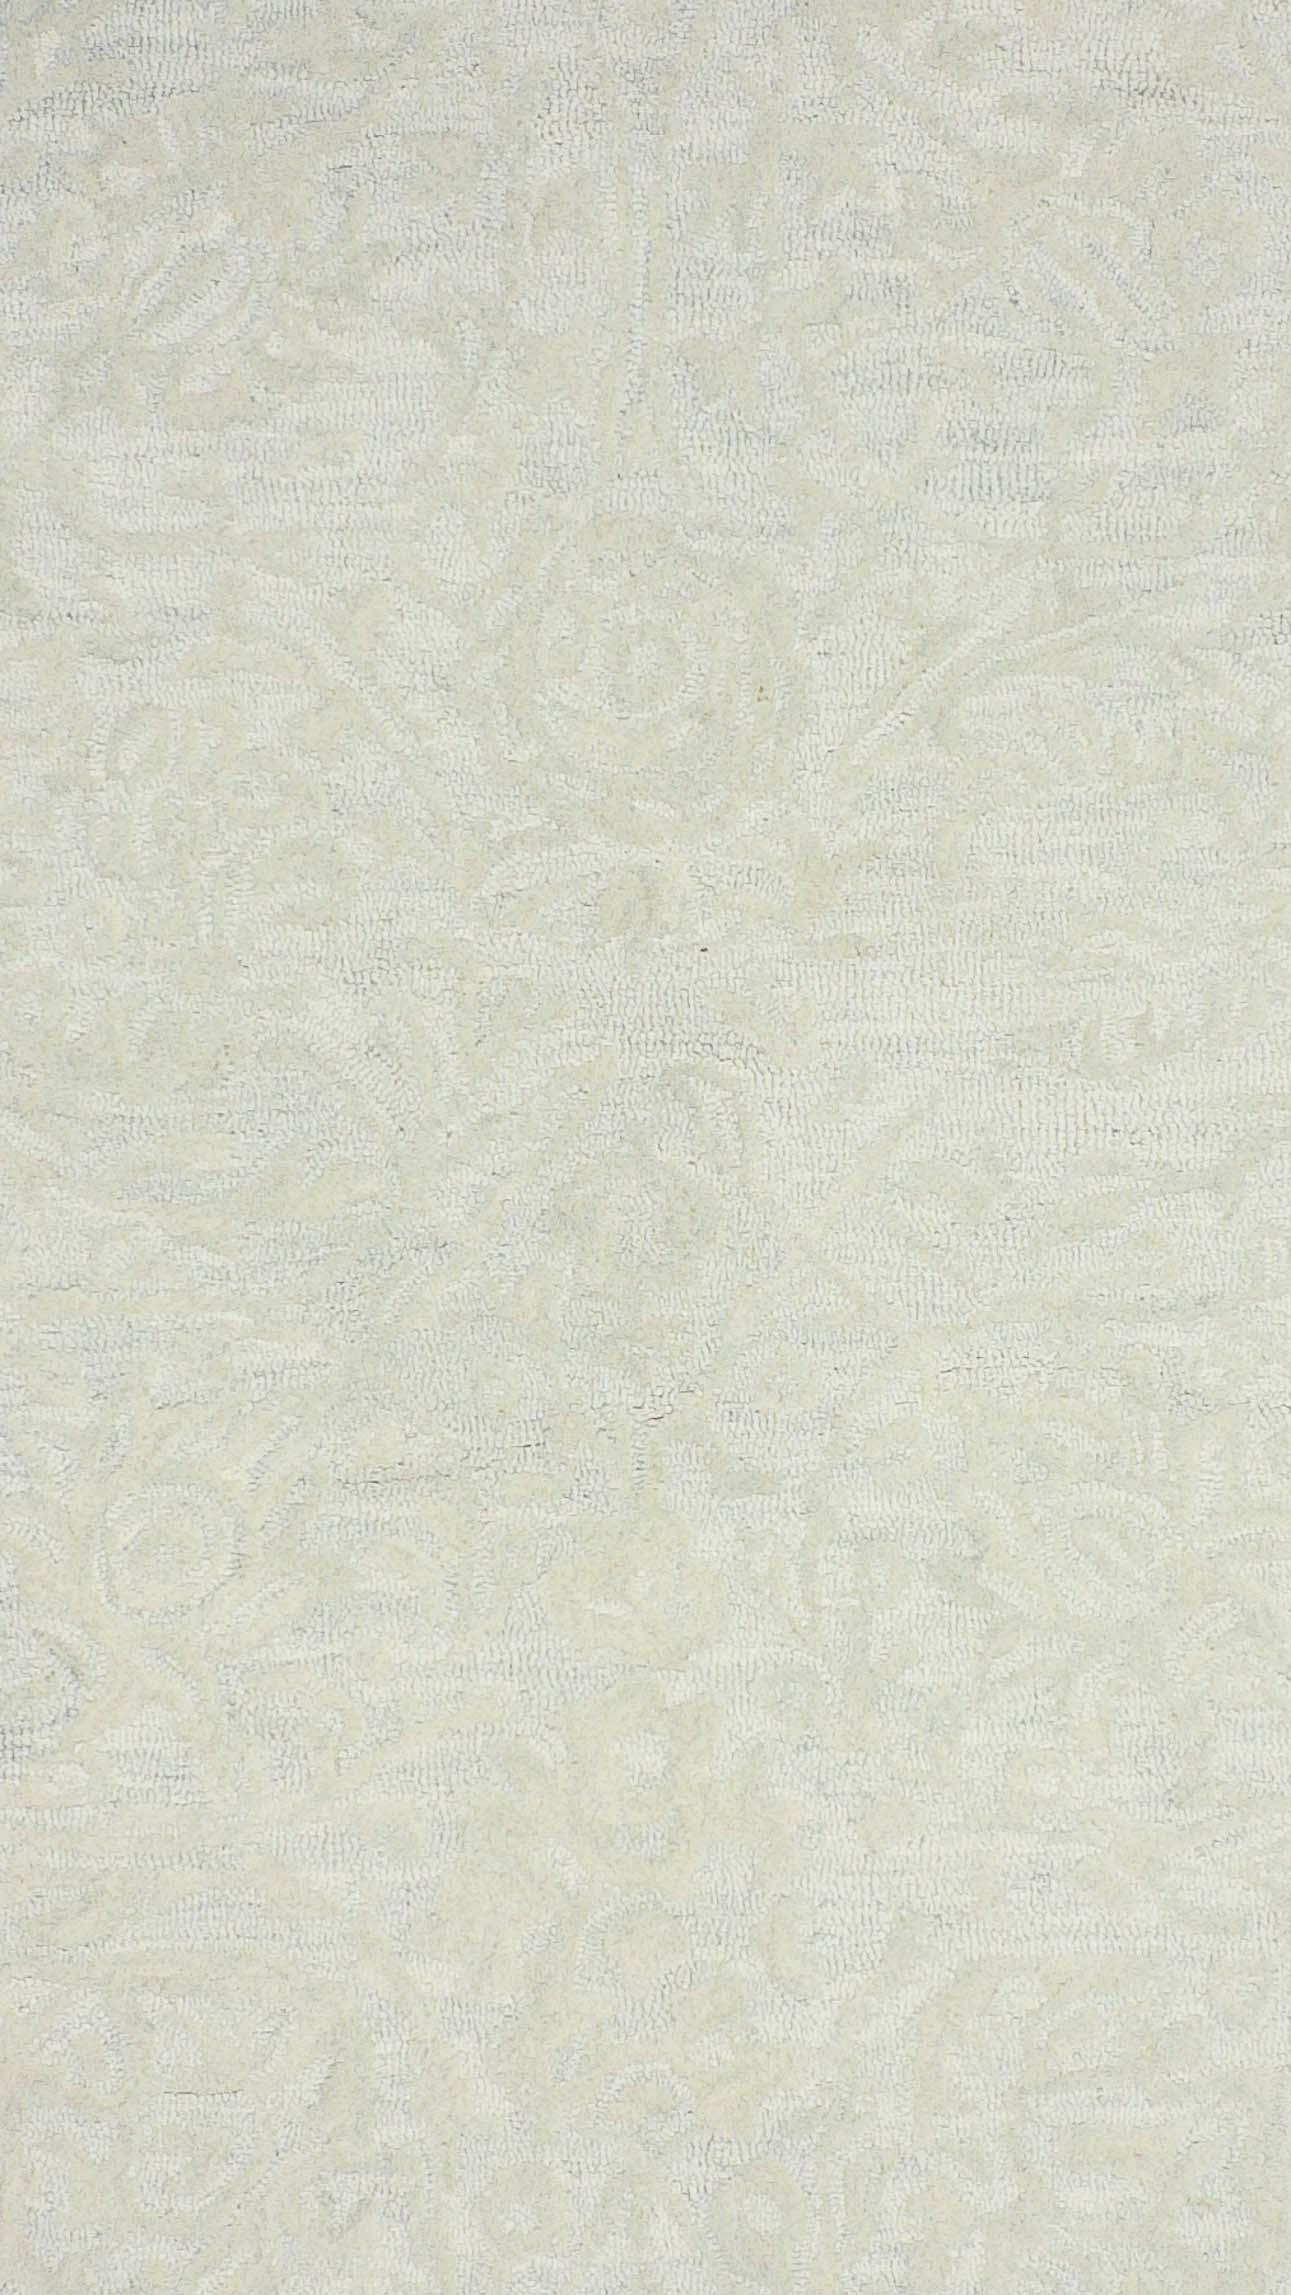 HAMPM1_HamptonsClassic_Mist_200x300-closeup